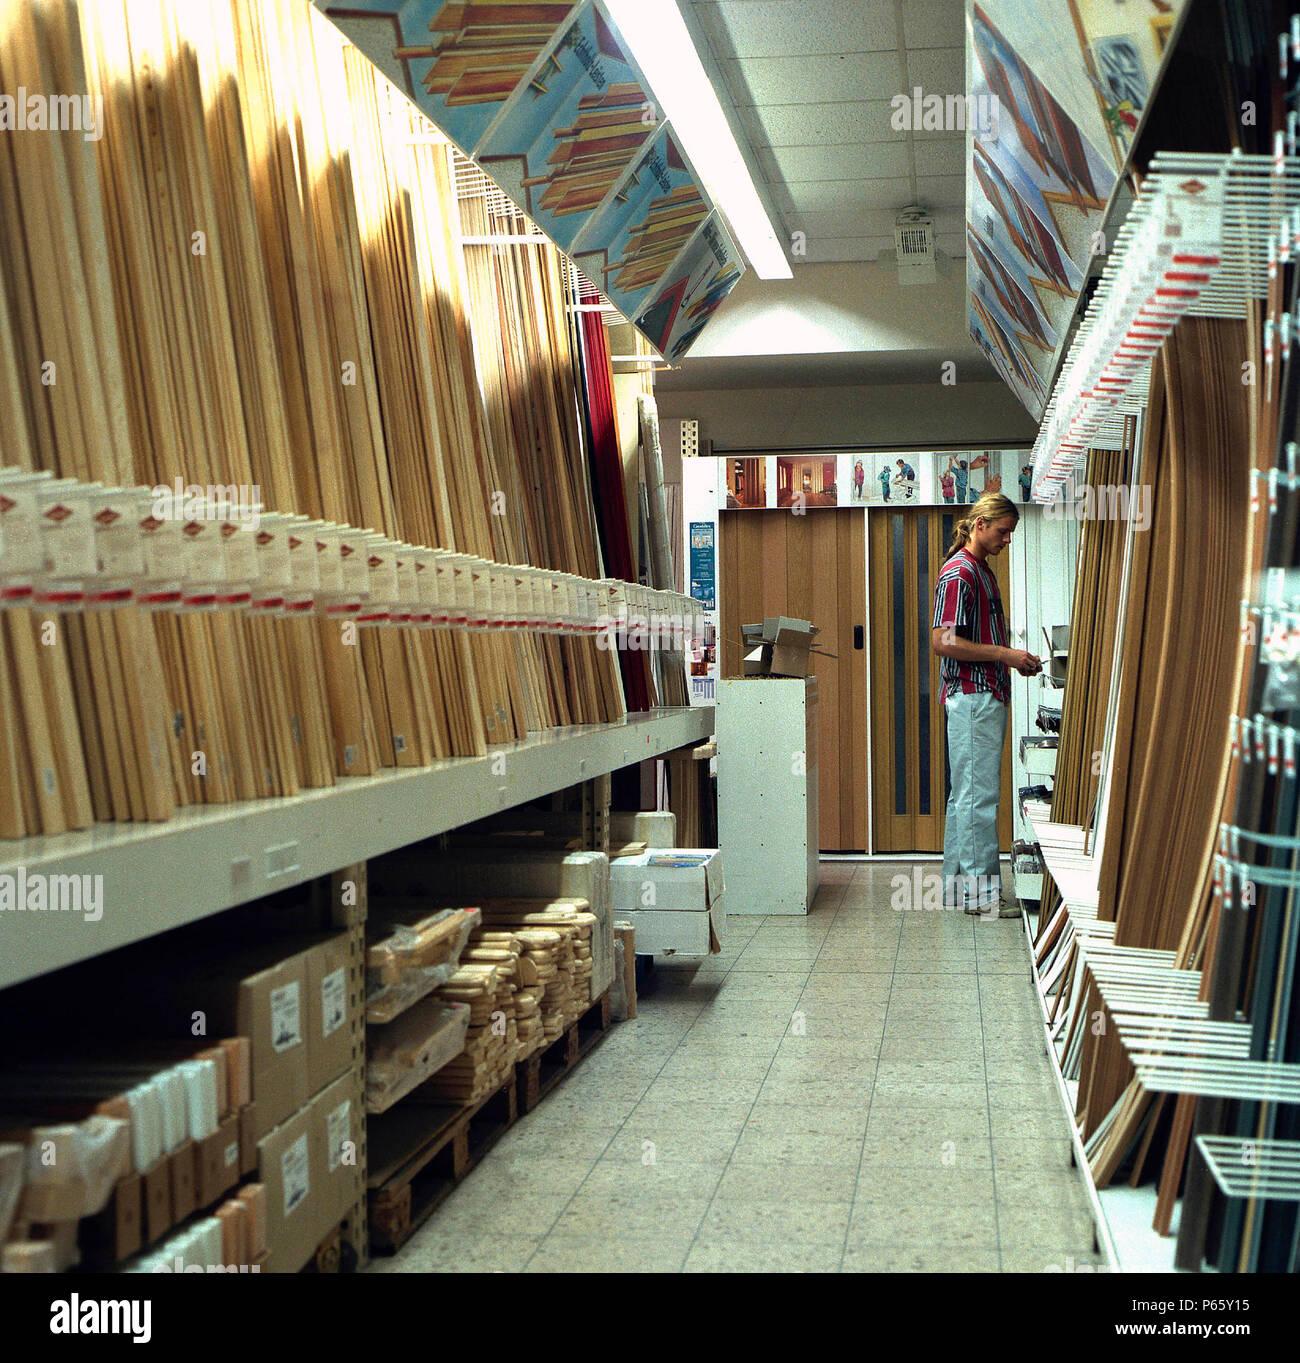 Hardware Store Shelves Stock Photos Amp Hardware Store